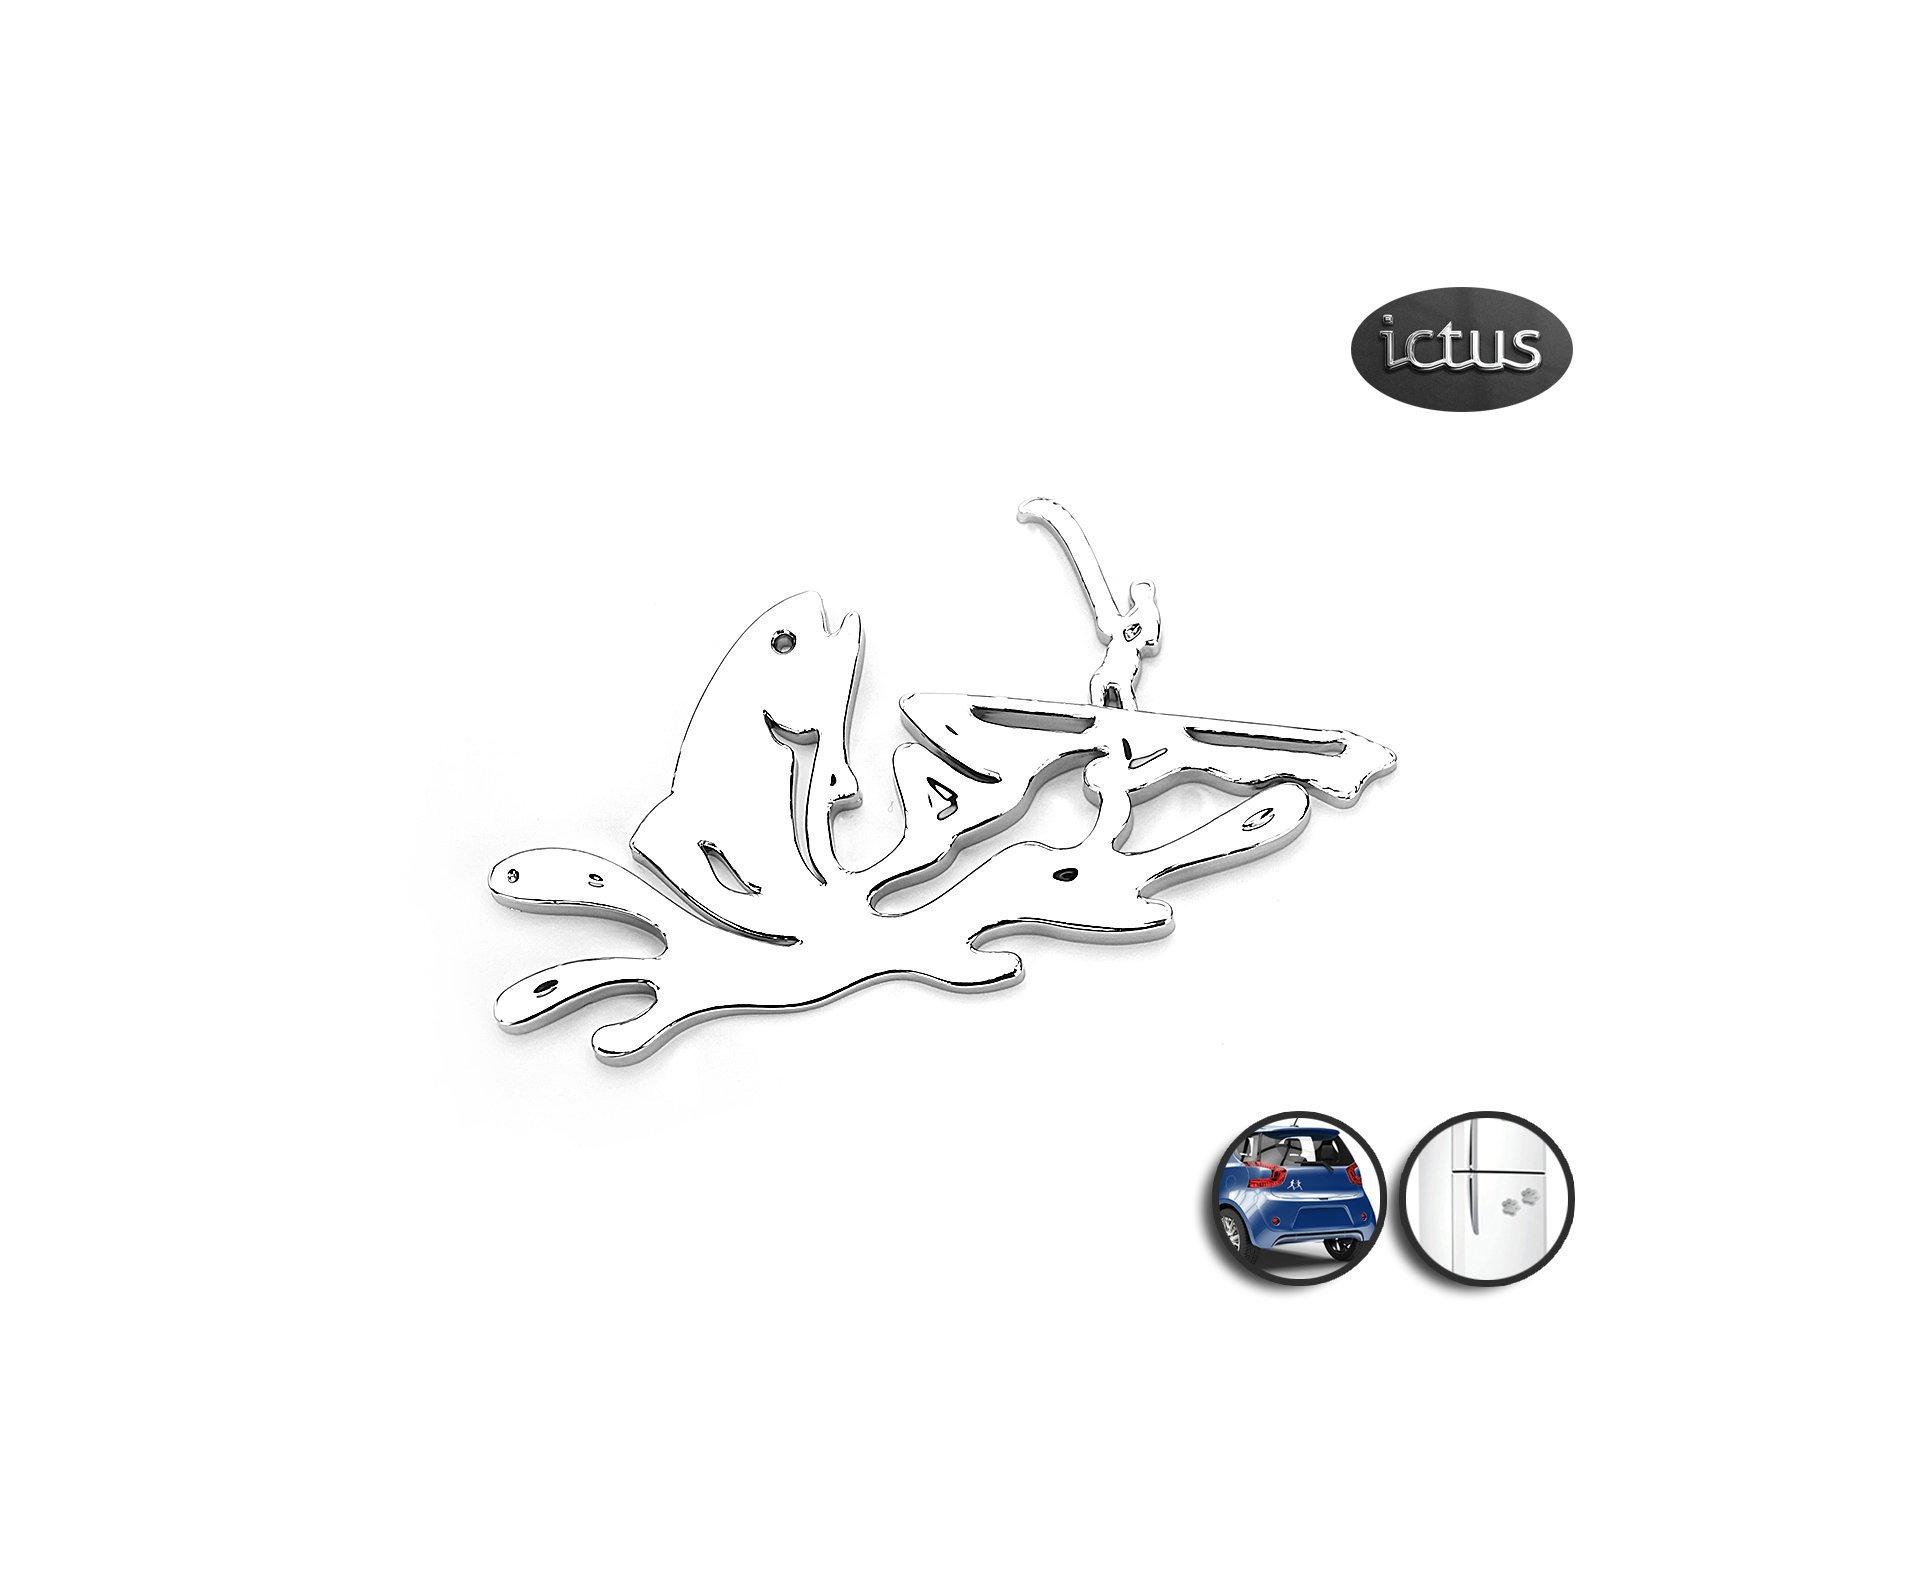 Emblema Pescador - Ictus